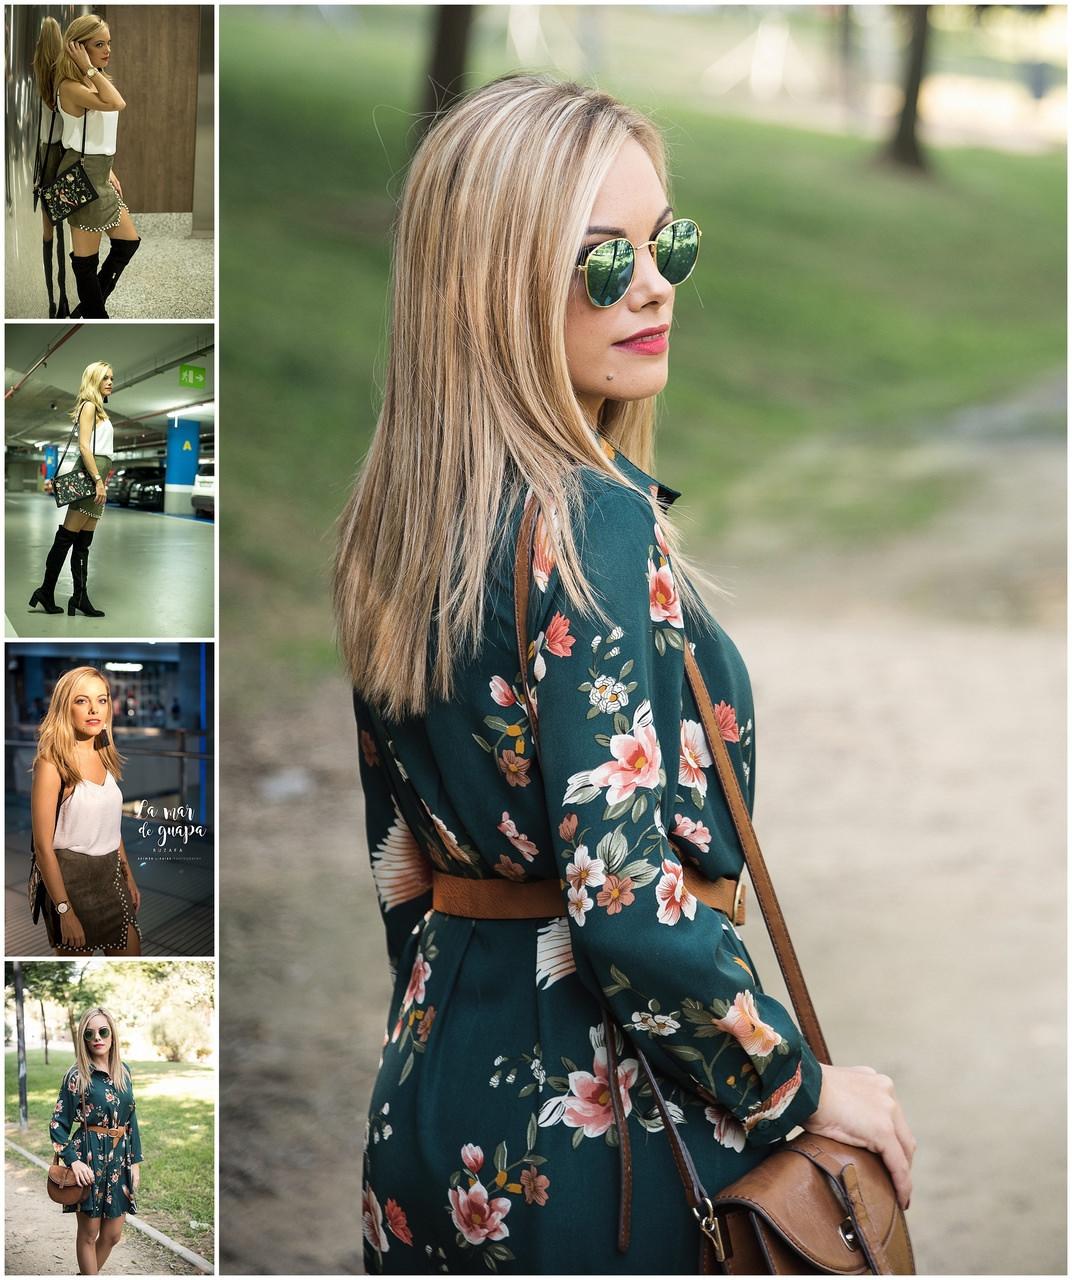 fotografo moda valencia-ruzafa7